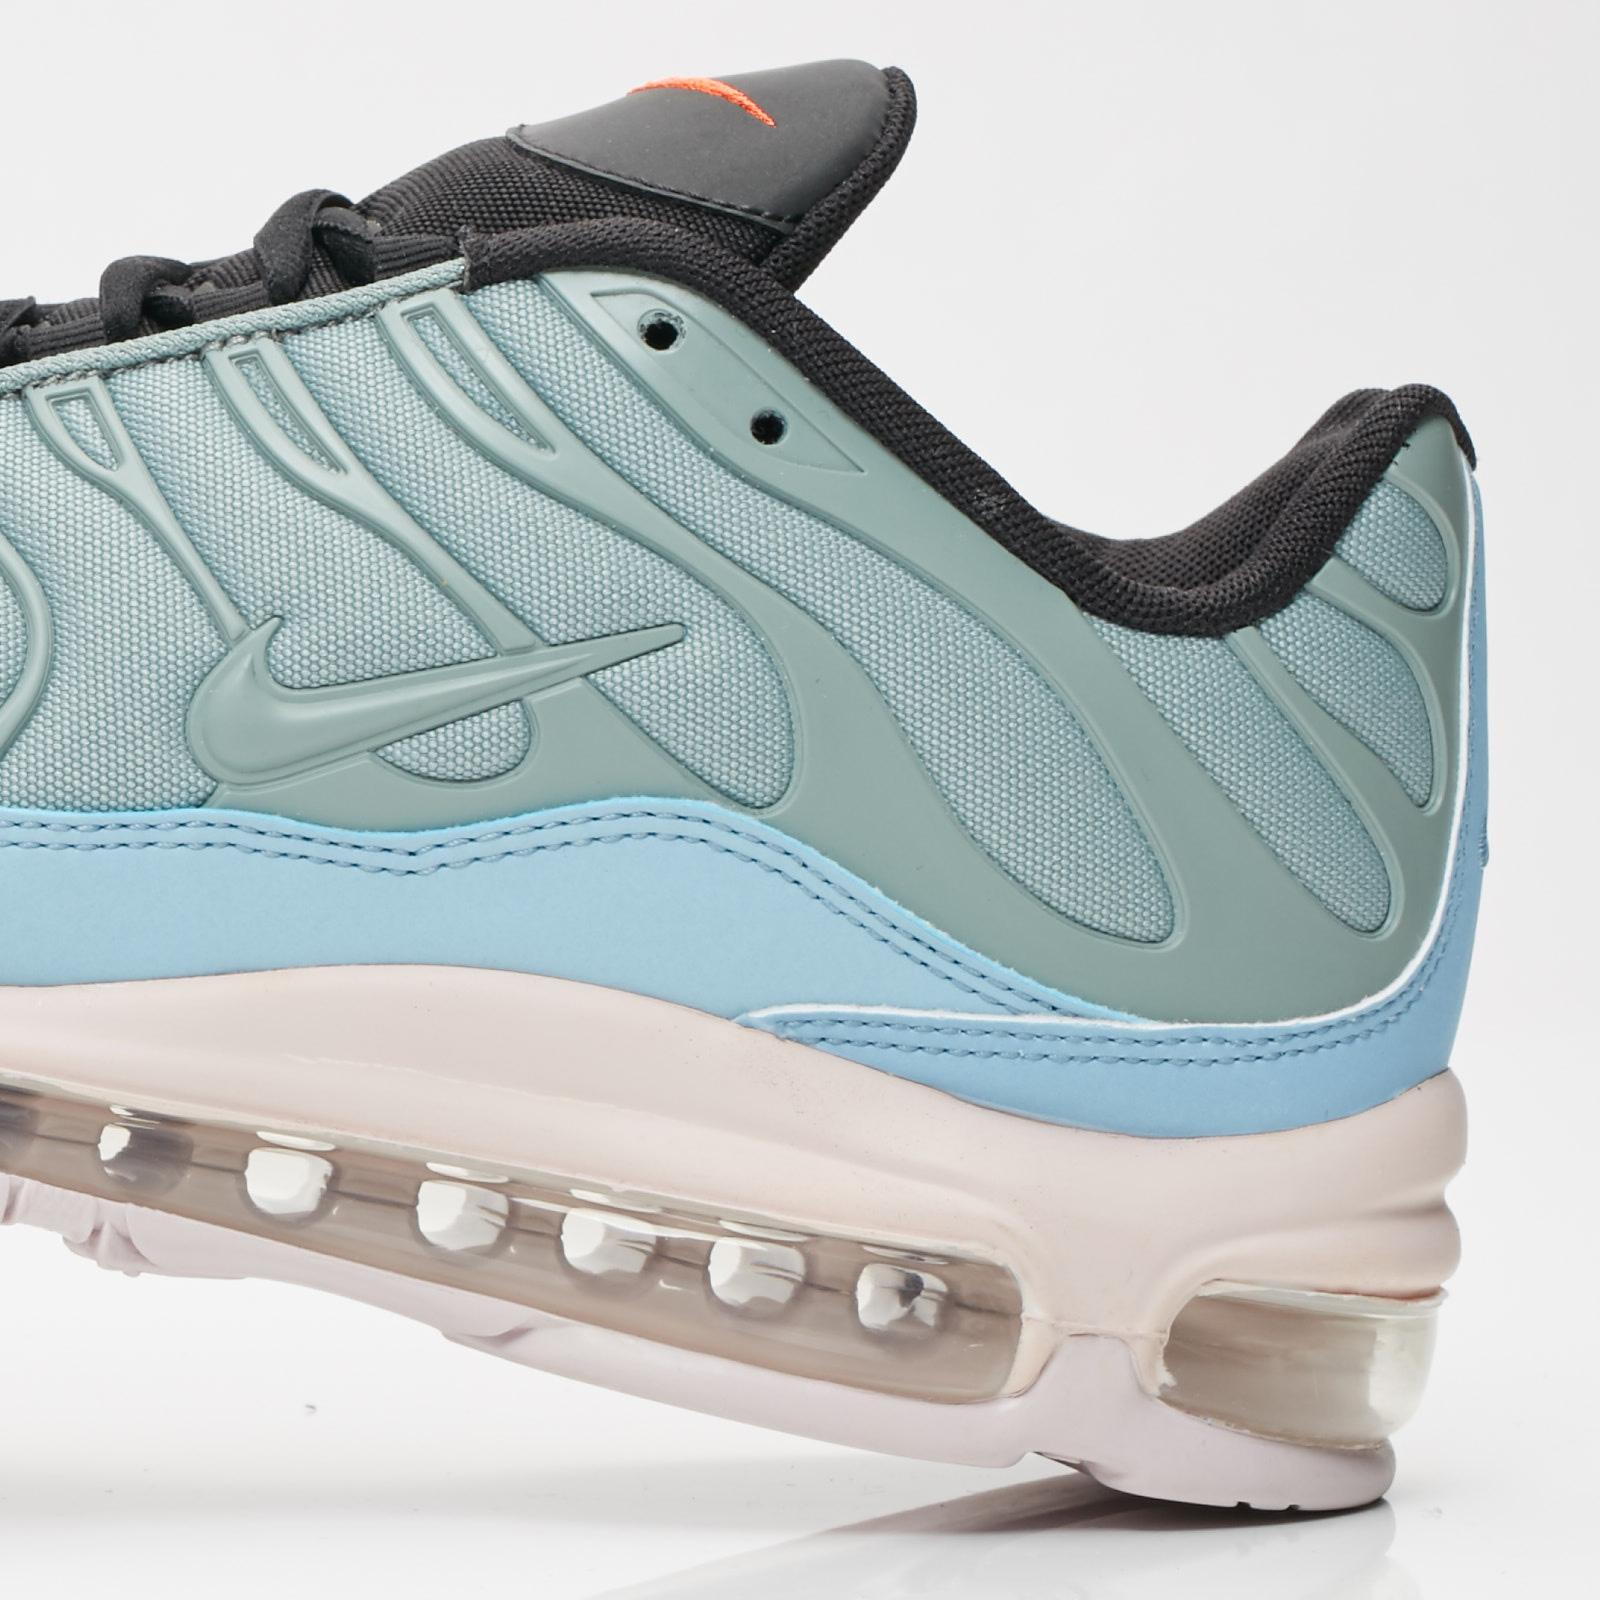 Nike Air Max 97 Plus Ah8144 300 Sneakersnstuff I